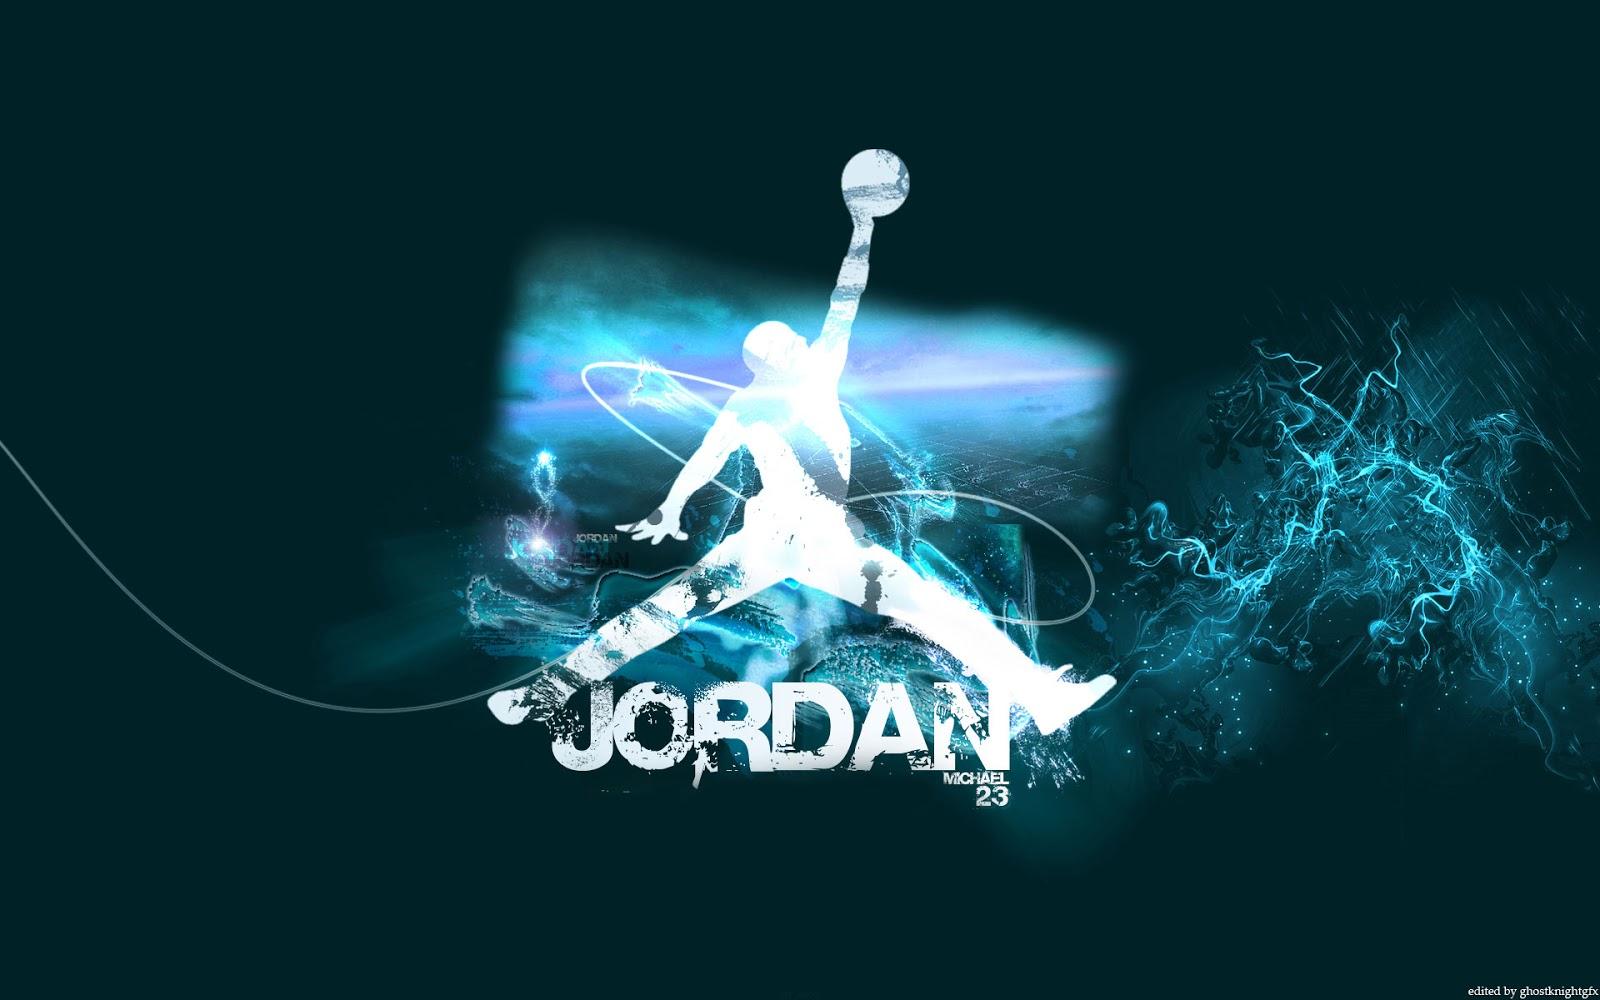 jordan hd wallpapers michael jordan hd wallpapers michael jordan 1600x1000